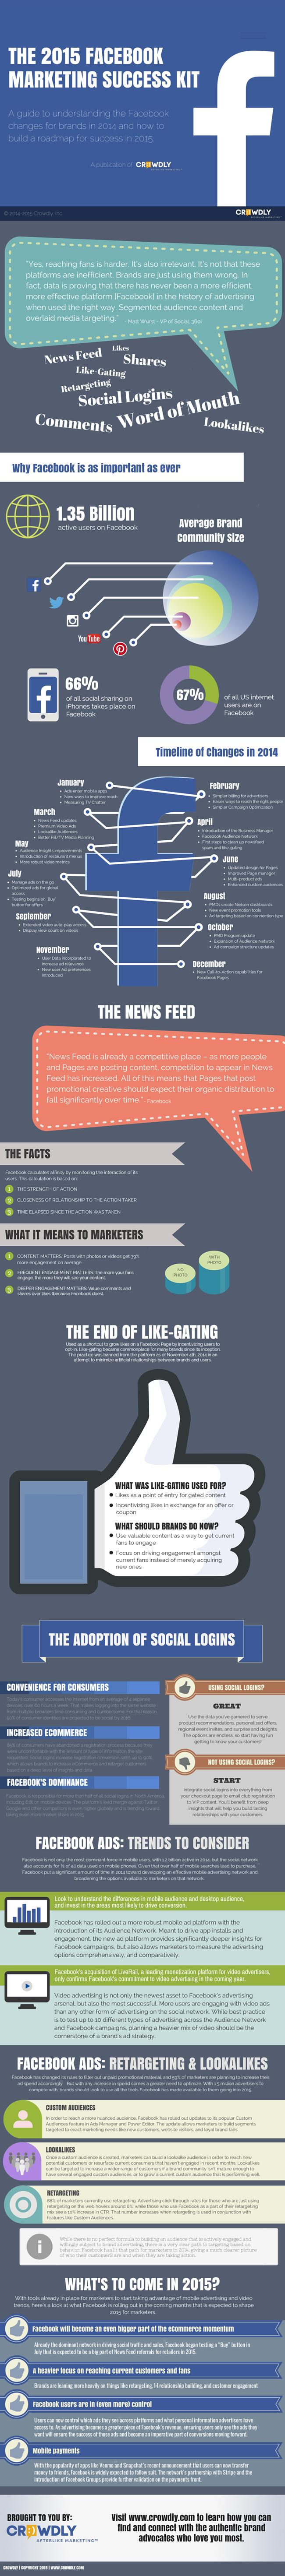 Facebook-Marketing-Kit